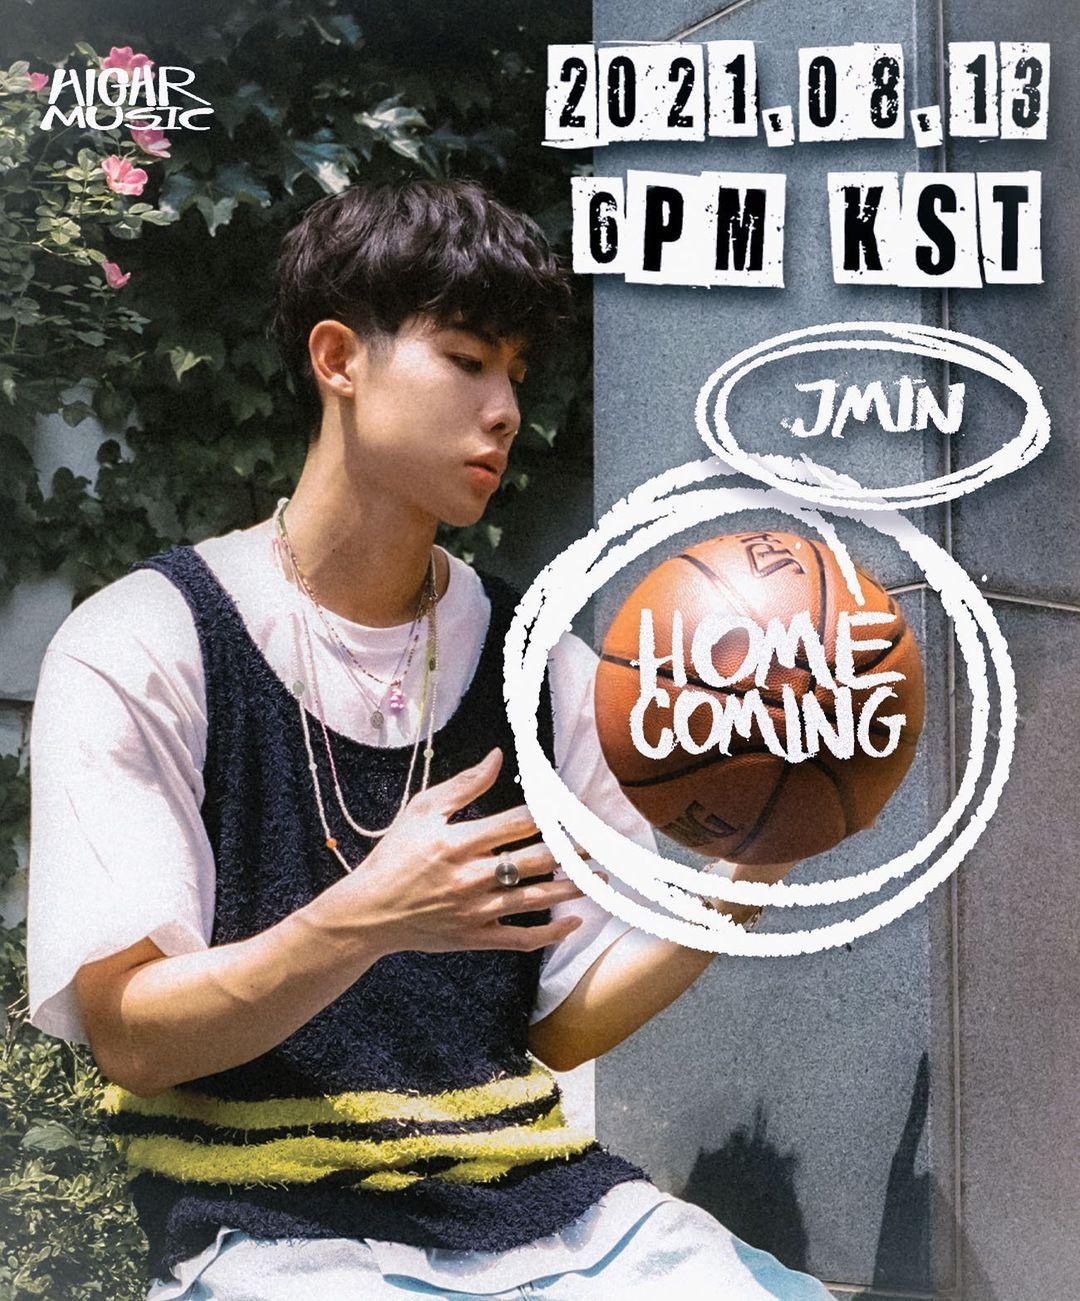 JMIN HomeComing